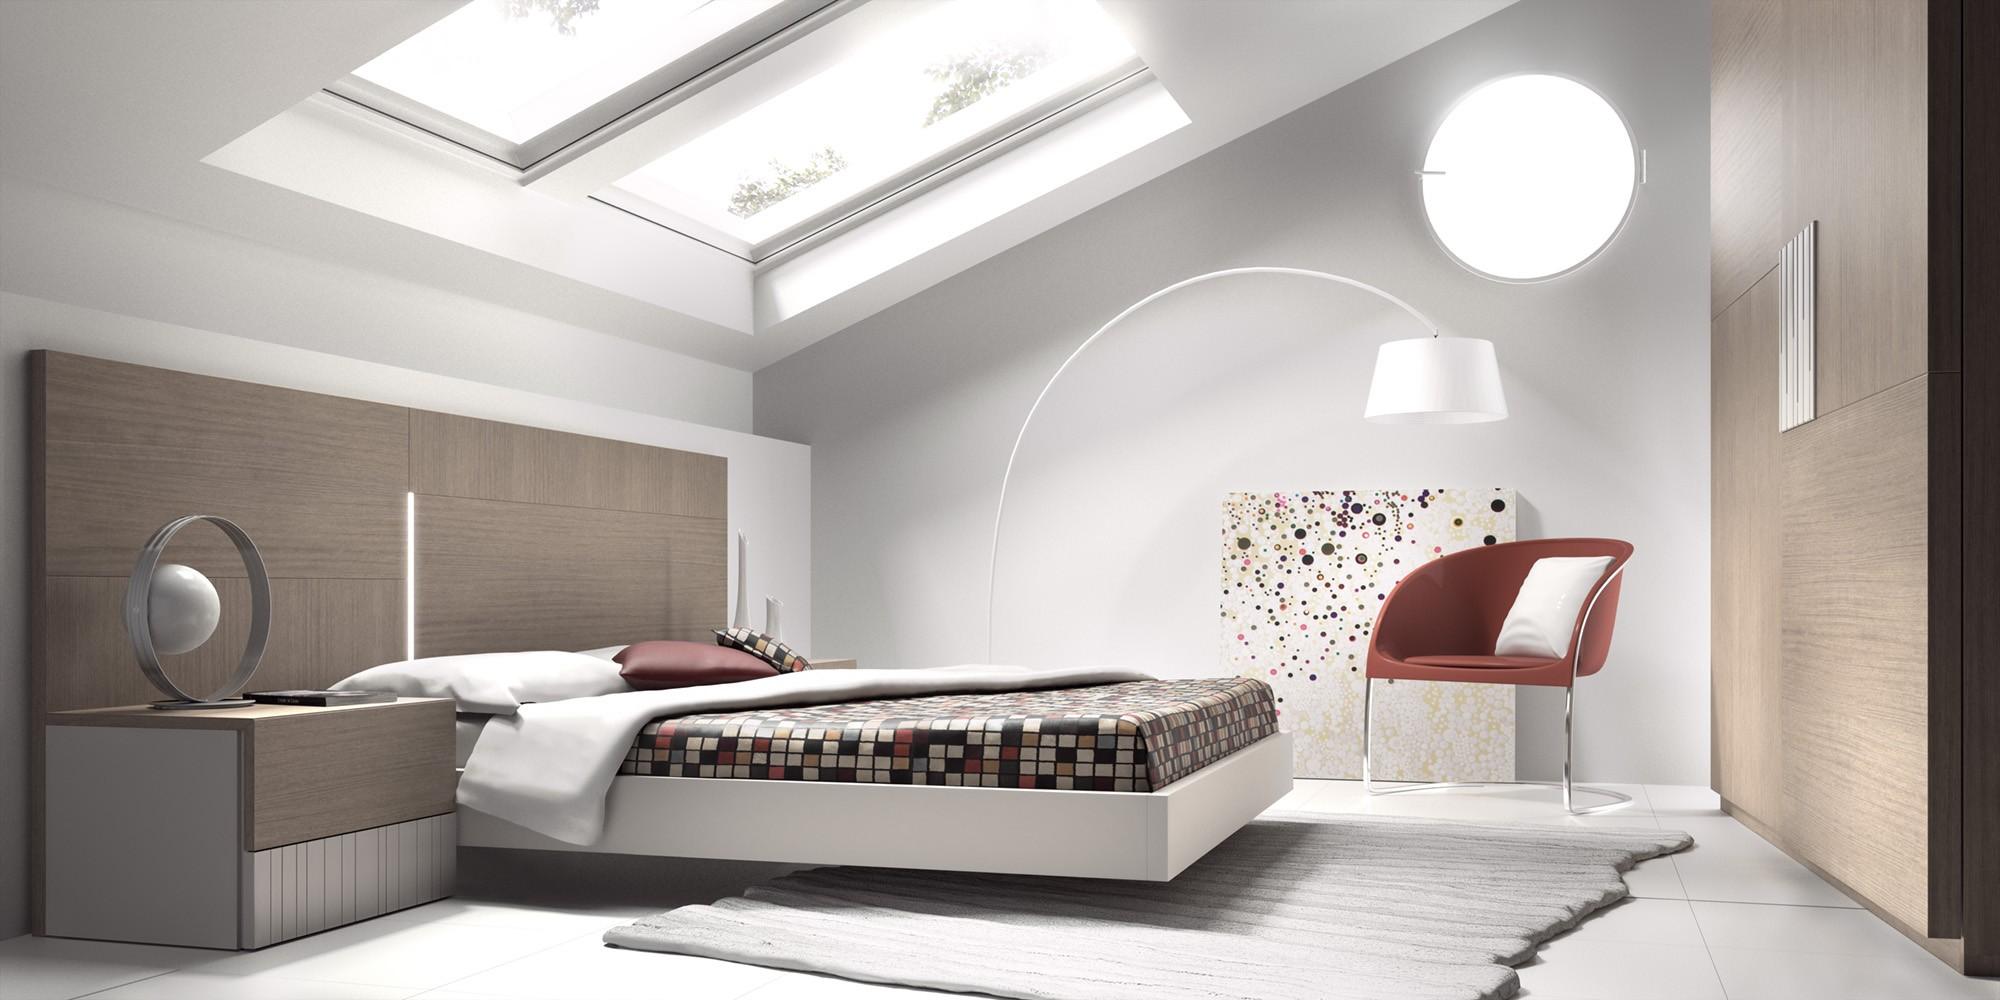 Matrimonio Bed Uk : Guardia ona modern bed in wood veneer matt lacquer